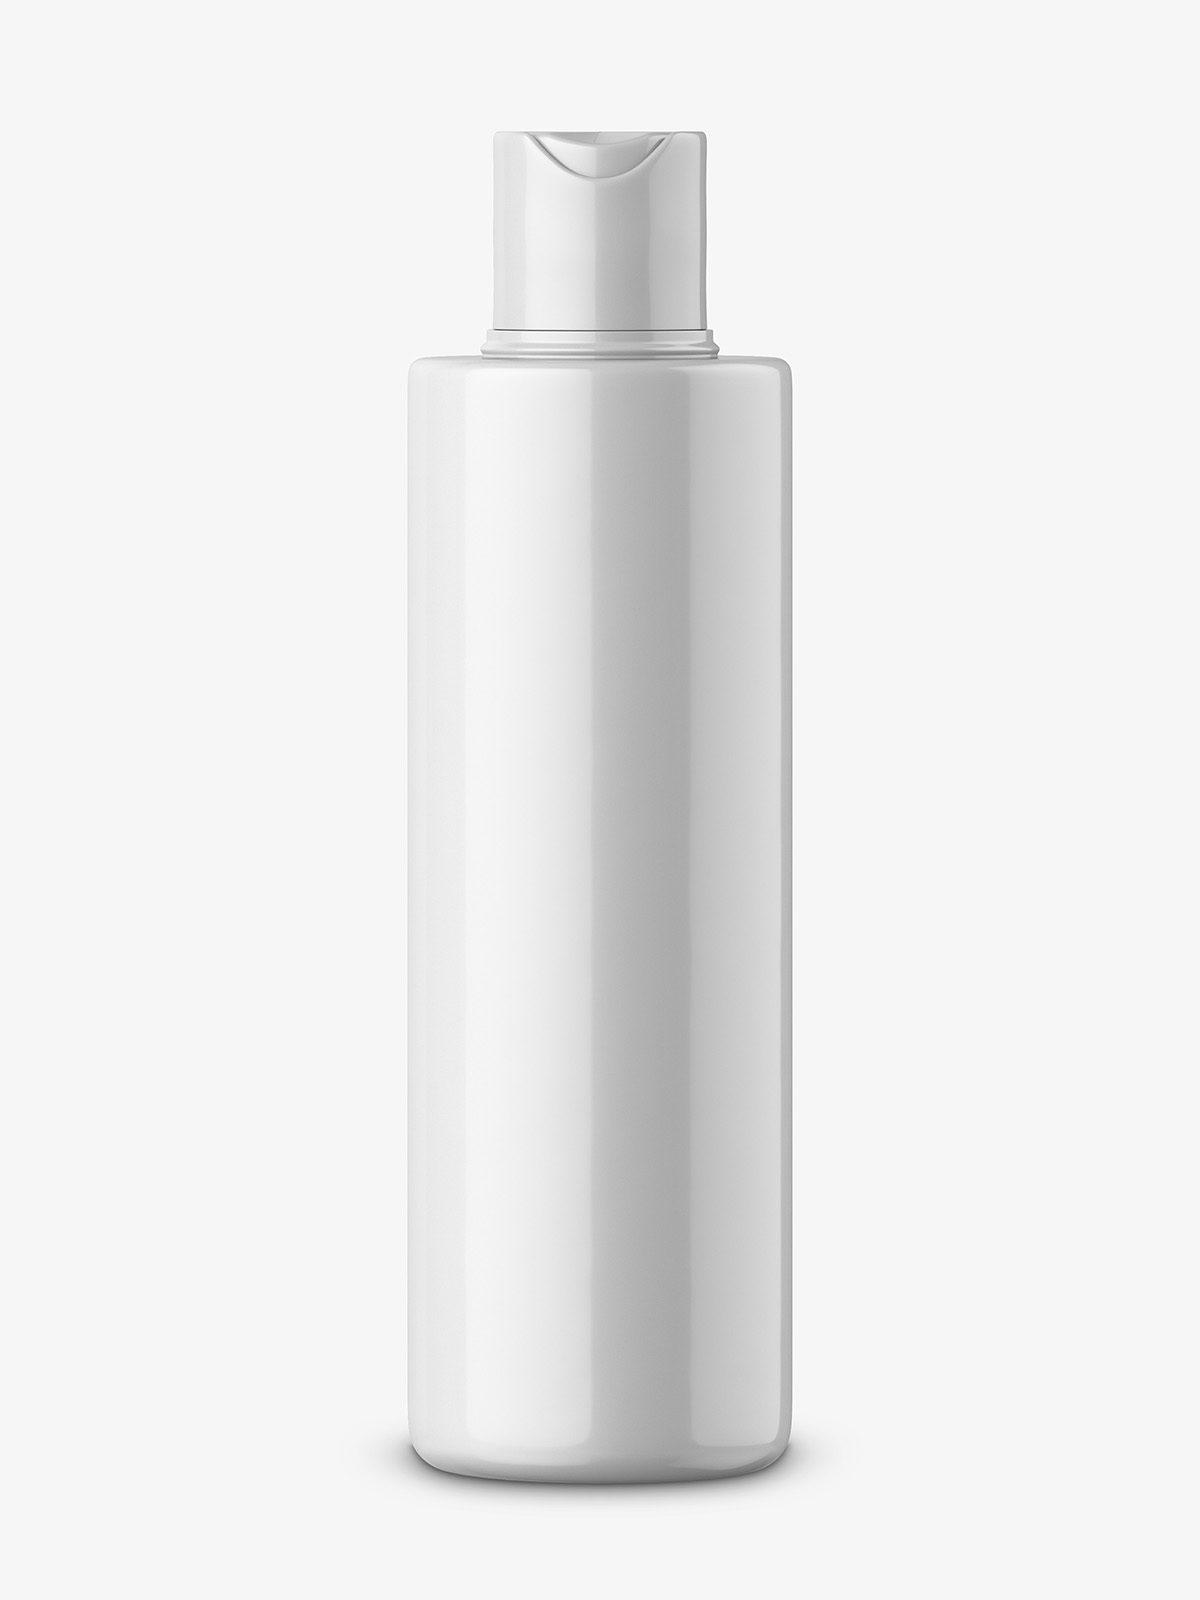 Glossy round bottle mockup